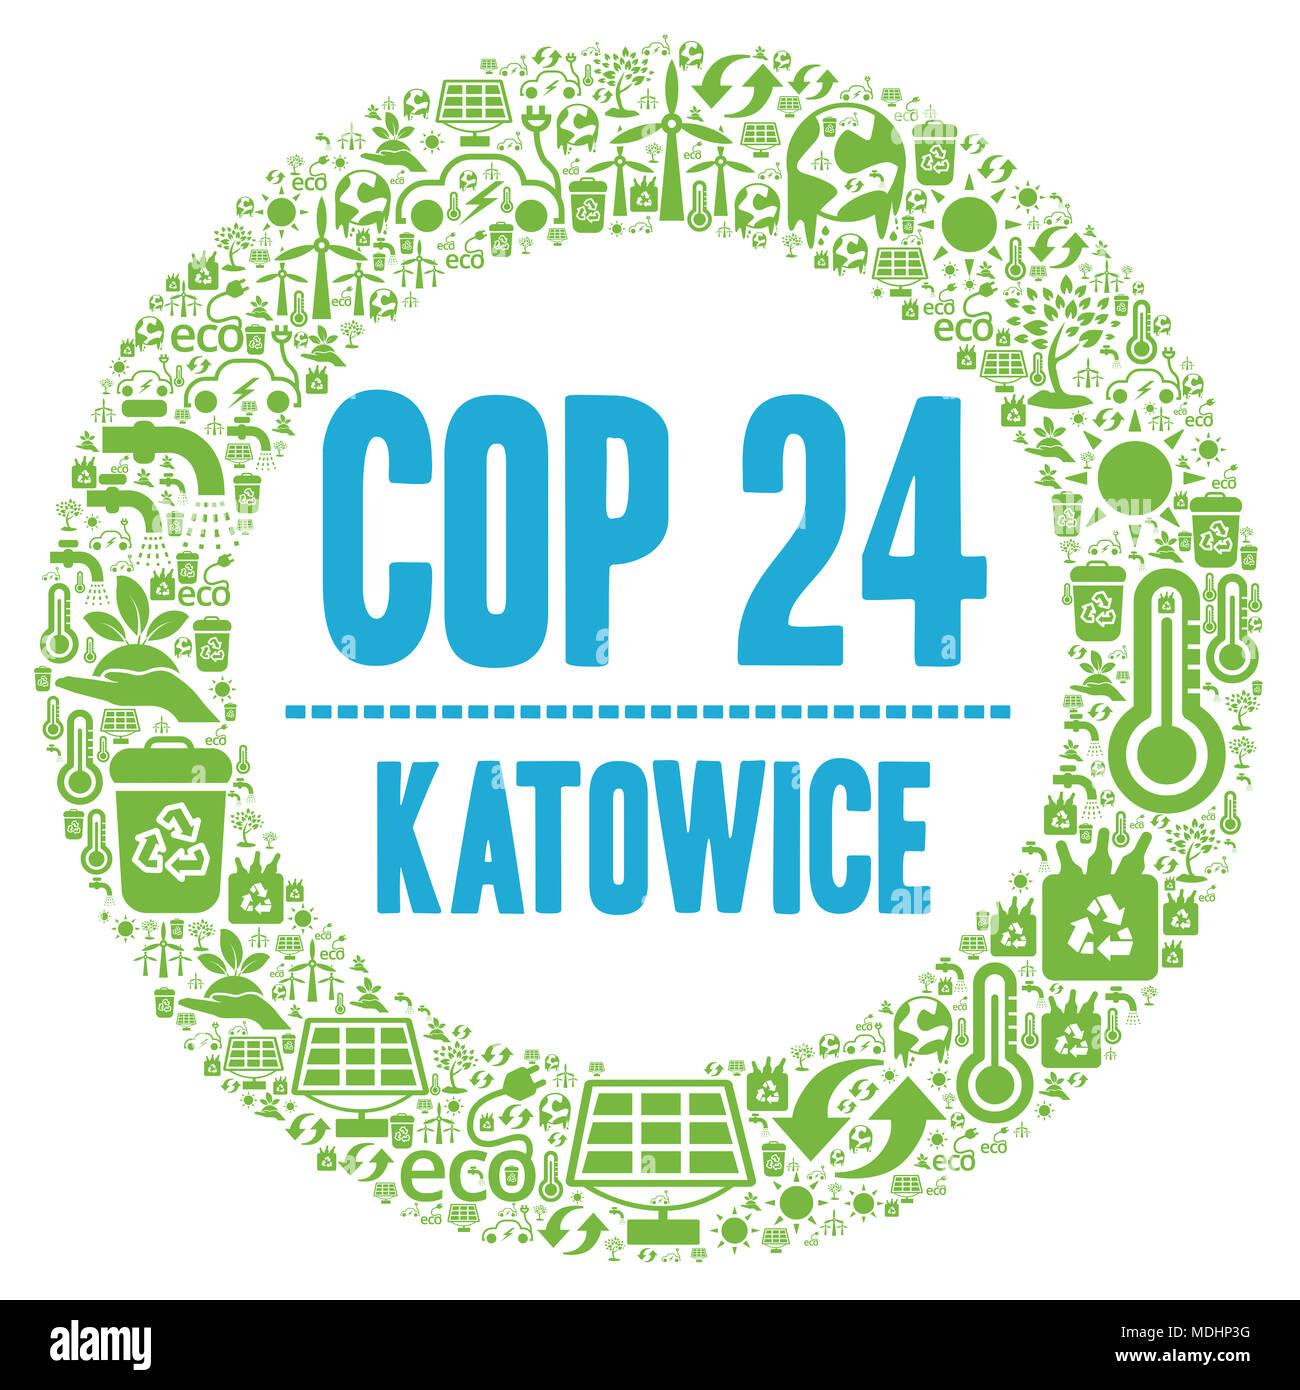 Cop 24 In Katowice Poland Stock Photo 180484740 Alamy